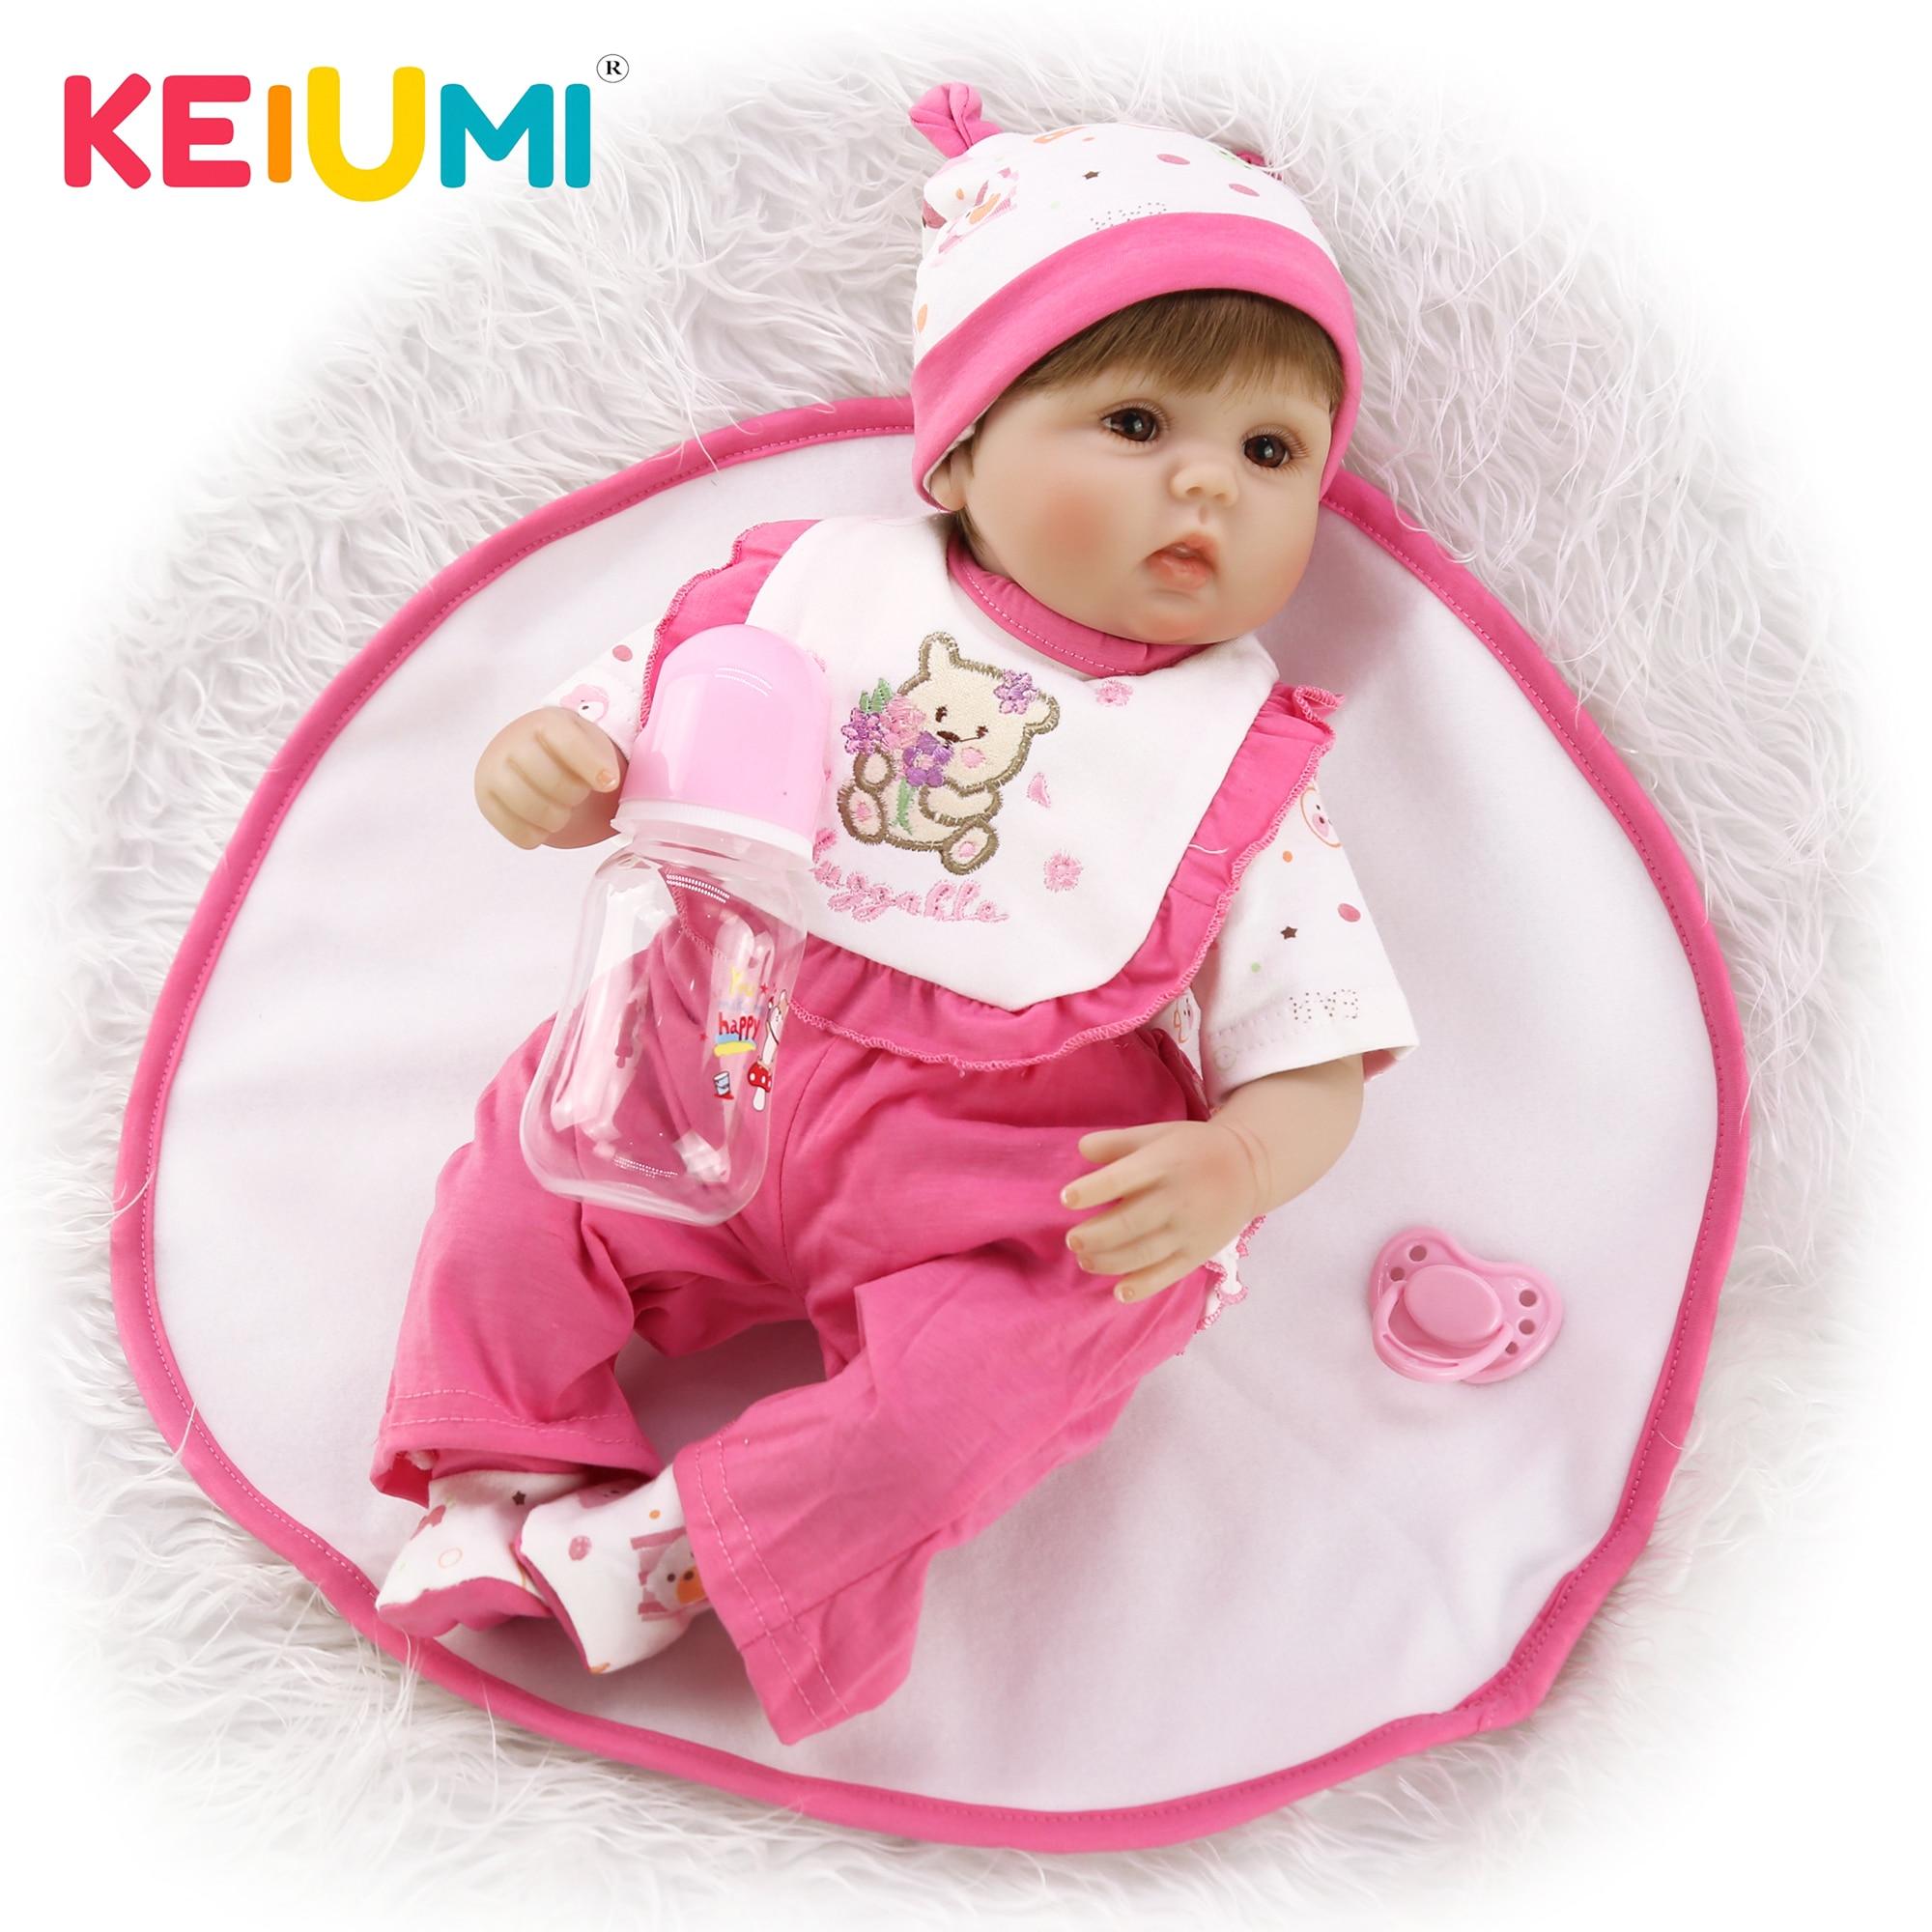 16 Inch Reborn Baby Dolls Realistic Vinyl Silicone Newborn Babies Girl Doll Gift